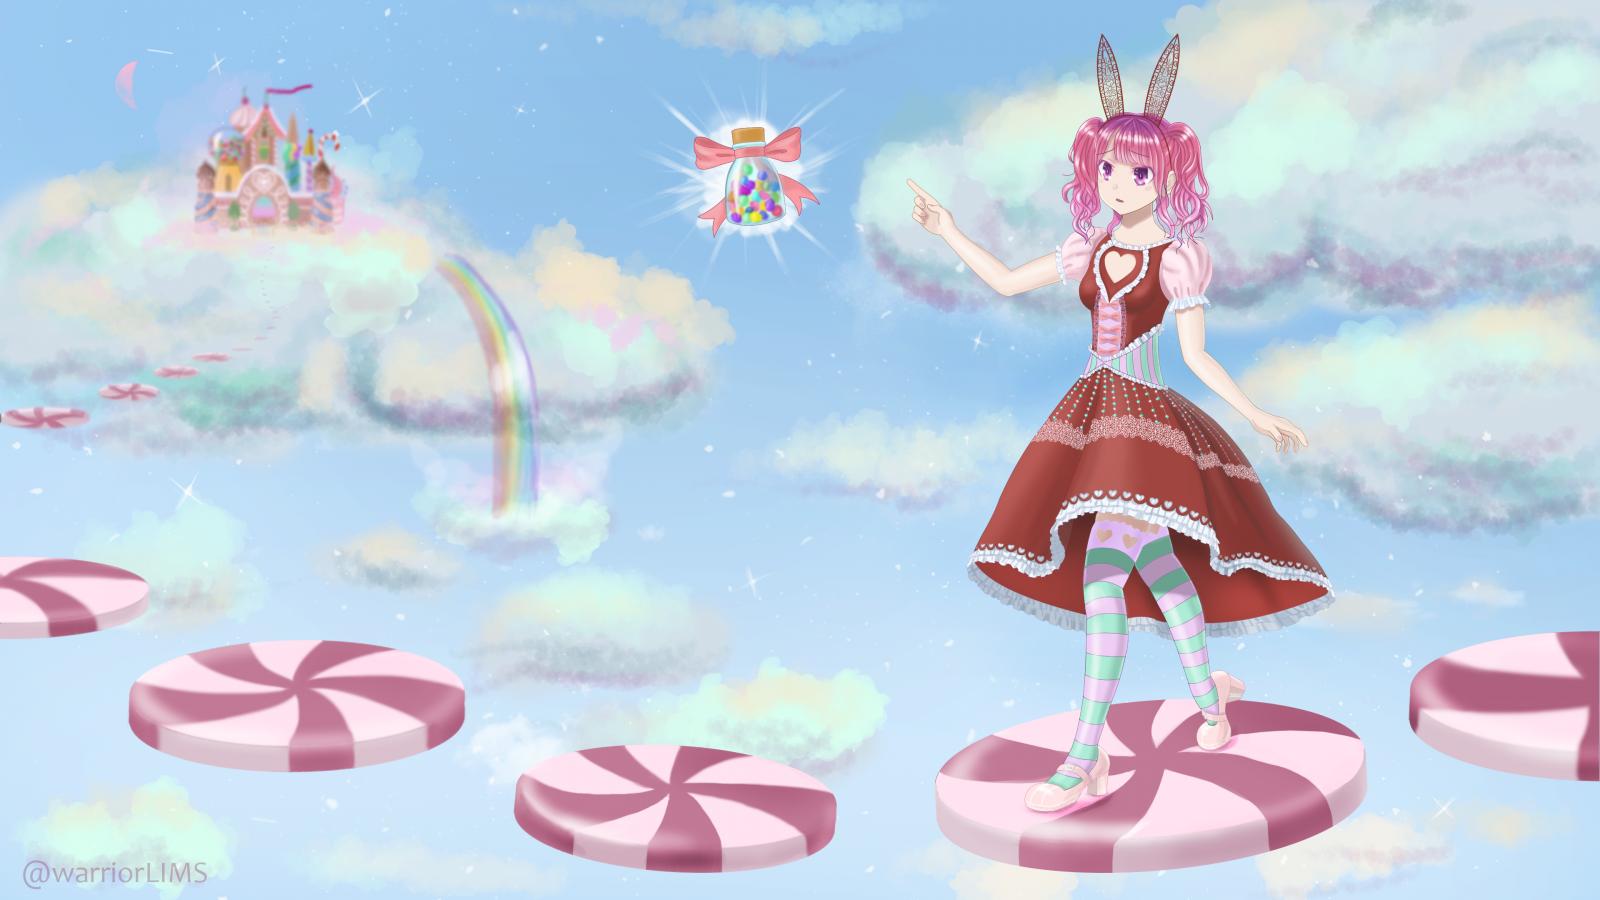 Wallpaper Anime Art Bunny Girl Candy Cute Heaven Kawaii Loli Lolita Fashion Pink Rainbow Sky Sweet 3840x2160 Warriorlimsofficial 1448645 Hd Wallpapers Wallhere